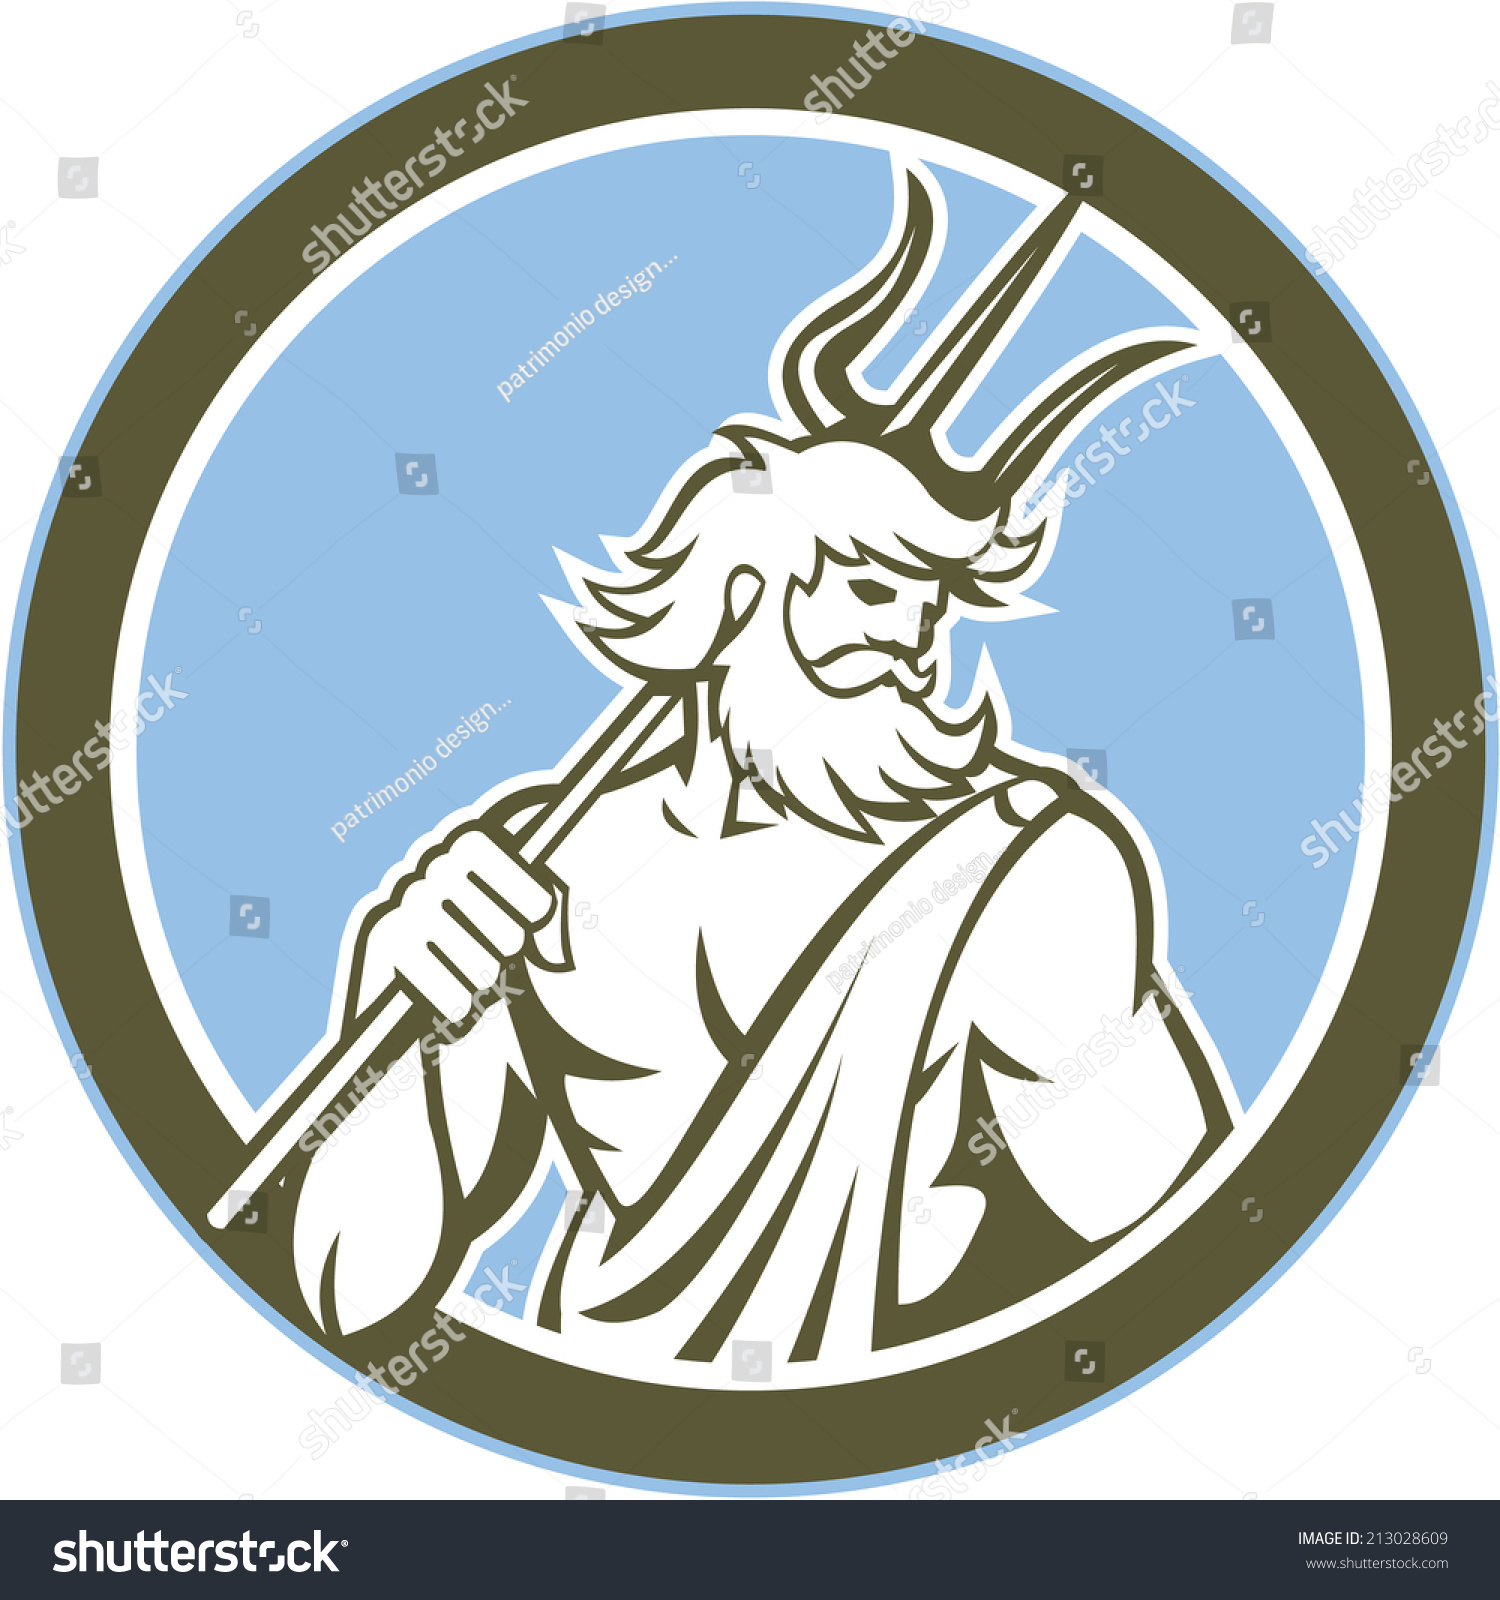 Illustration Of Roman God Of Sea Neptune Poseidon Of Greek Mythology